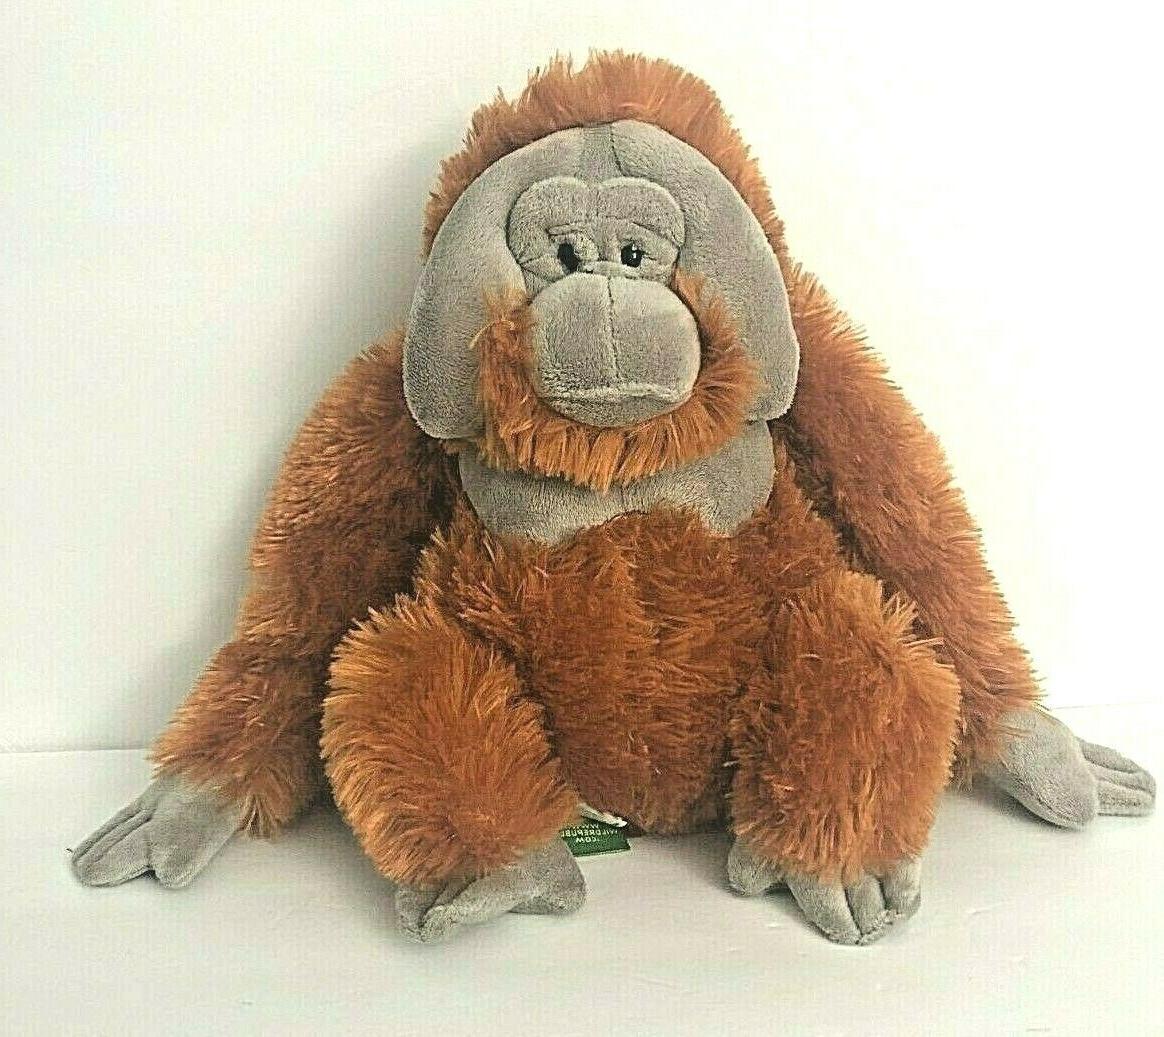 Wild Republic Orangutan Plush, Stuffed Animal, Plush Toy, Gi